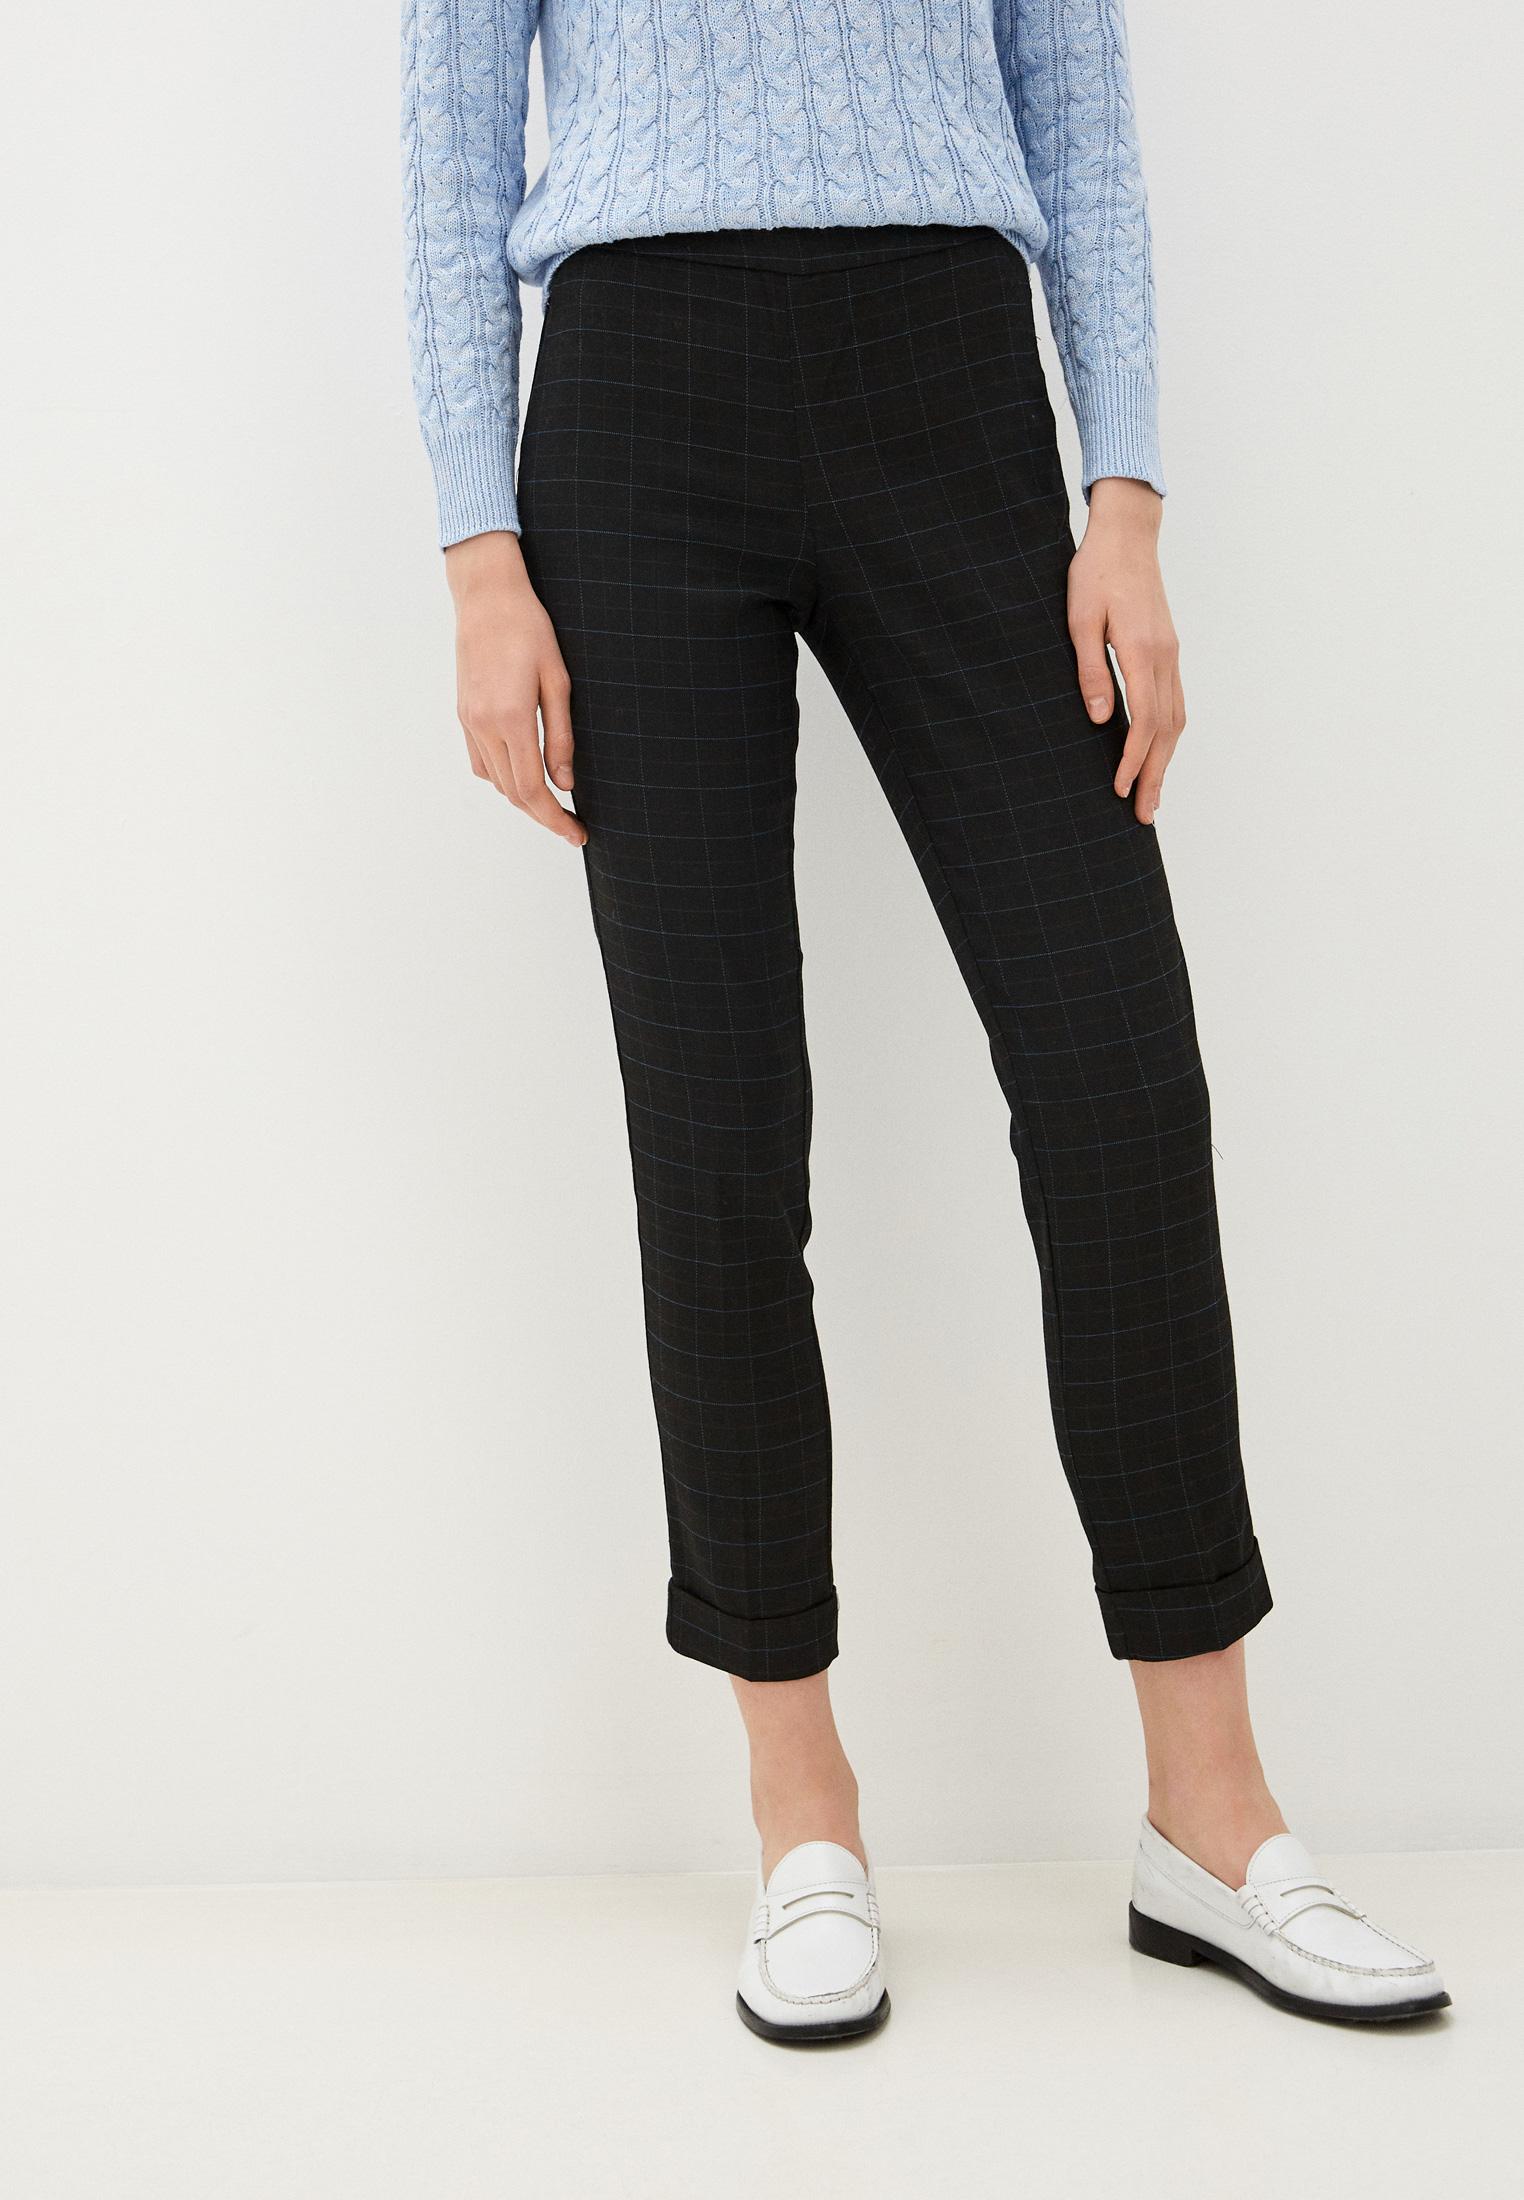 Женские классические брюки Zolla 22034737Z013